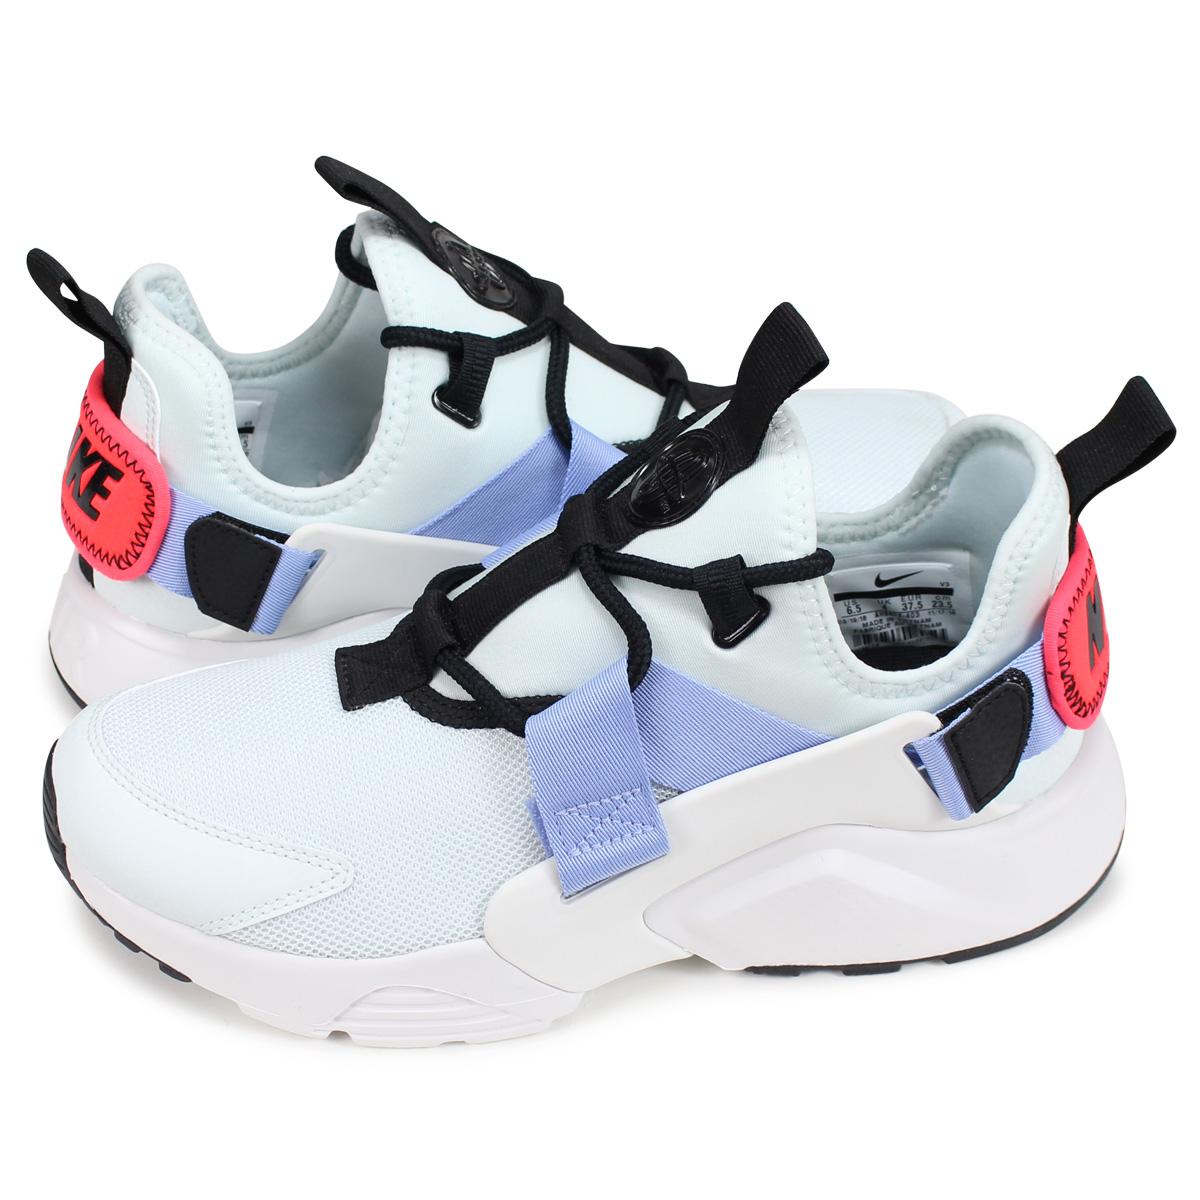 12b6cb5bd3b4f Nike NIKE エアハラチシティスニーカーレディースメンズ WMNS AIR HUARACHE CITY LOW white AH6804-403